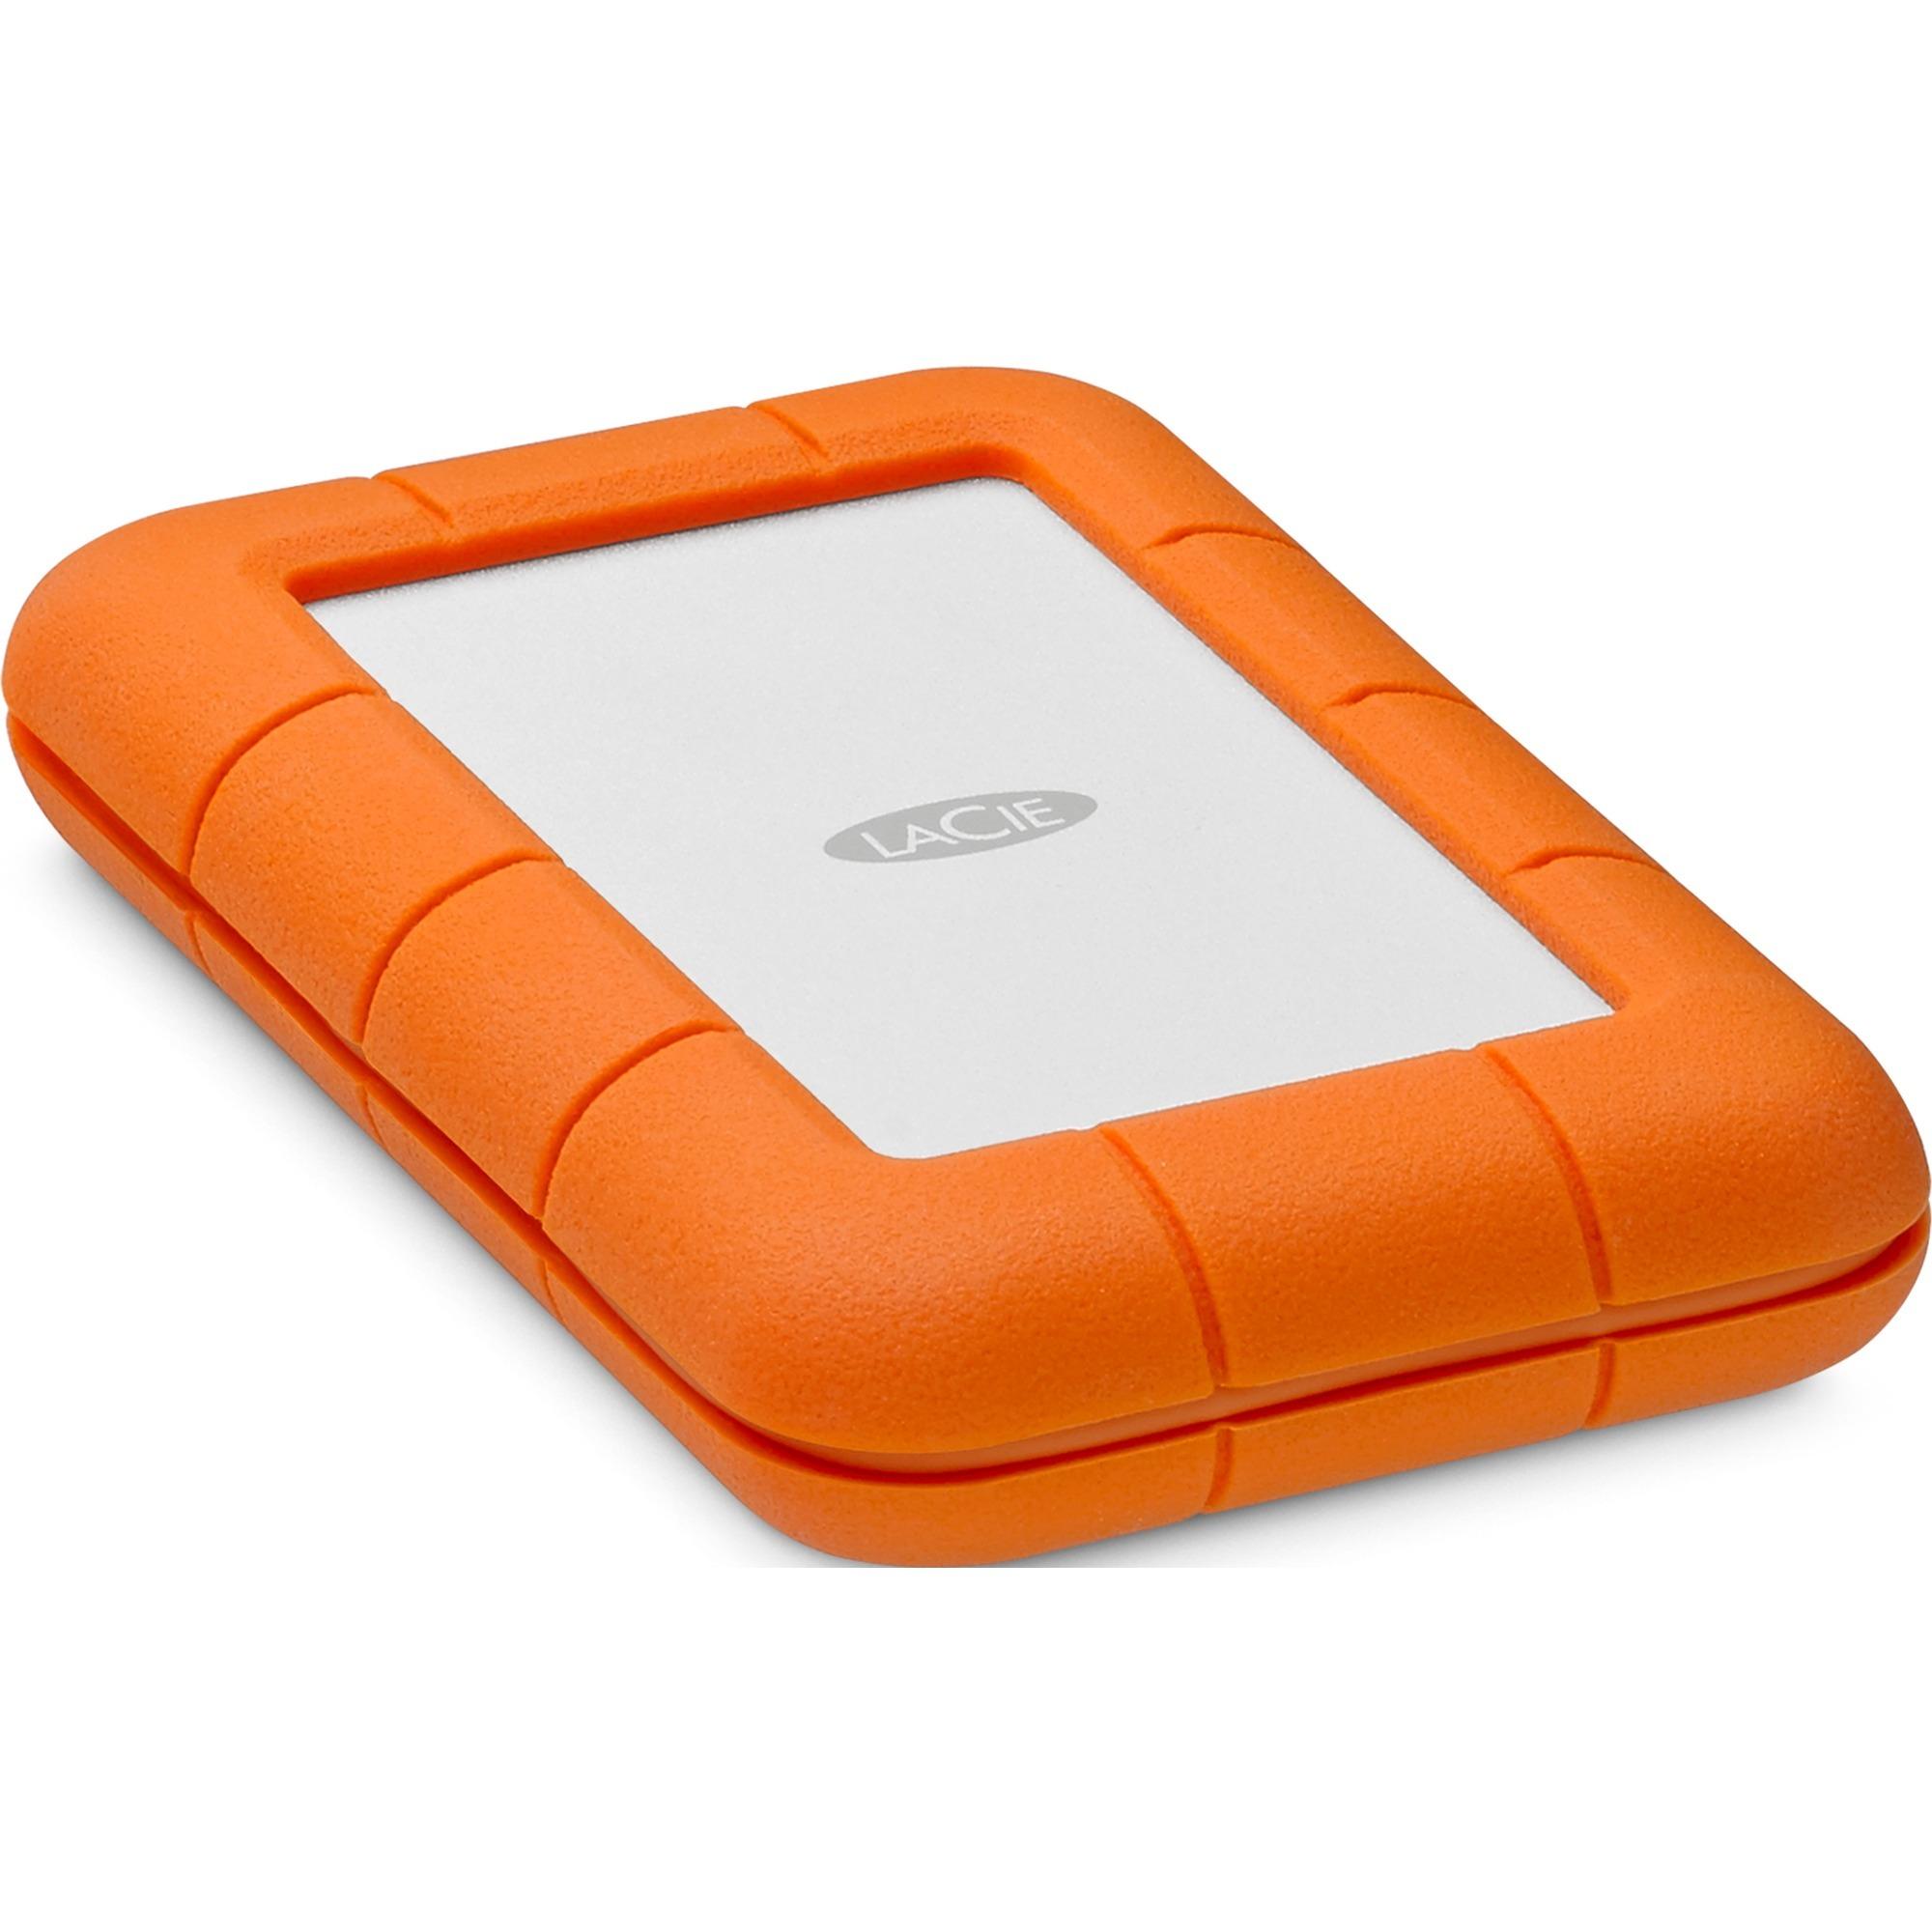 Rugged USB-C disco duro externo 2000 GB Naranja, Plata, Unidad de disco duro